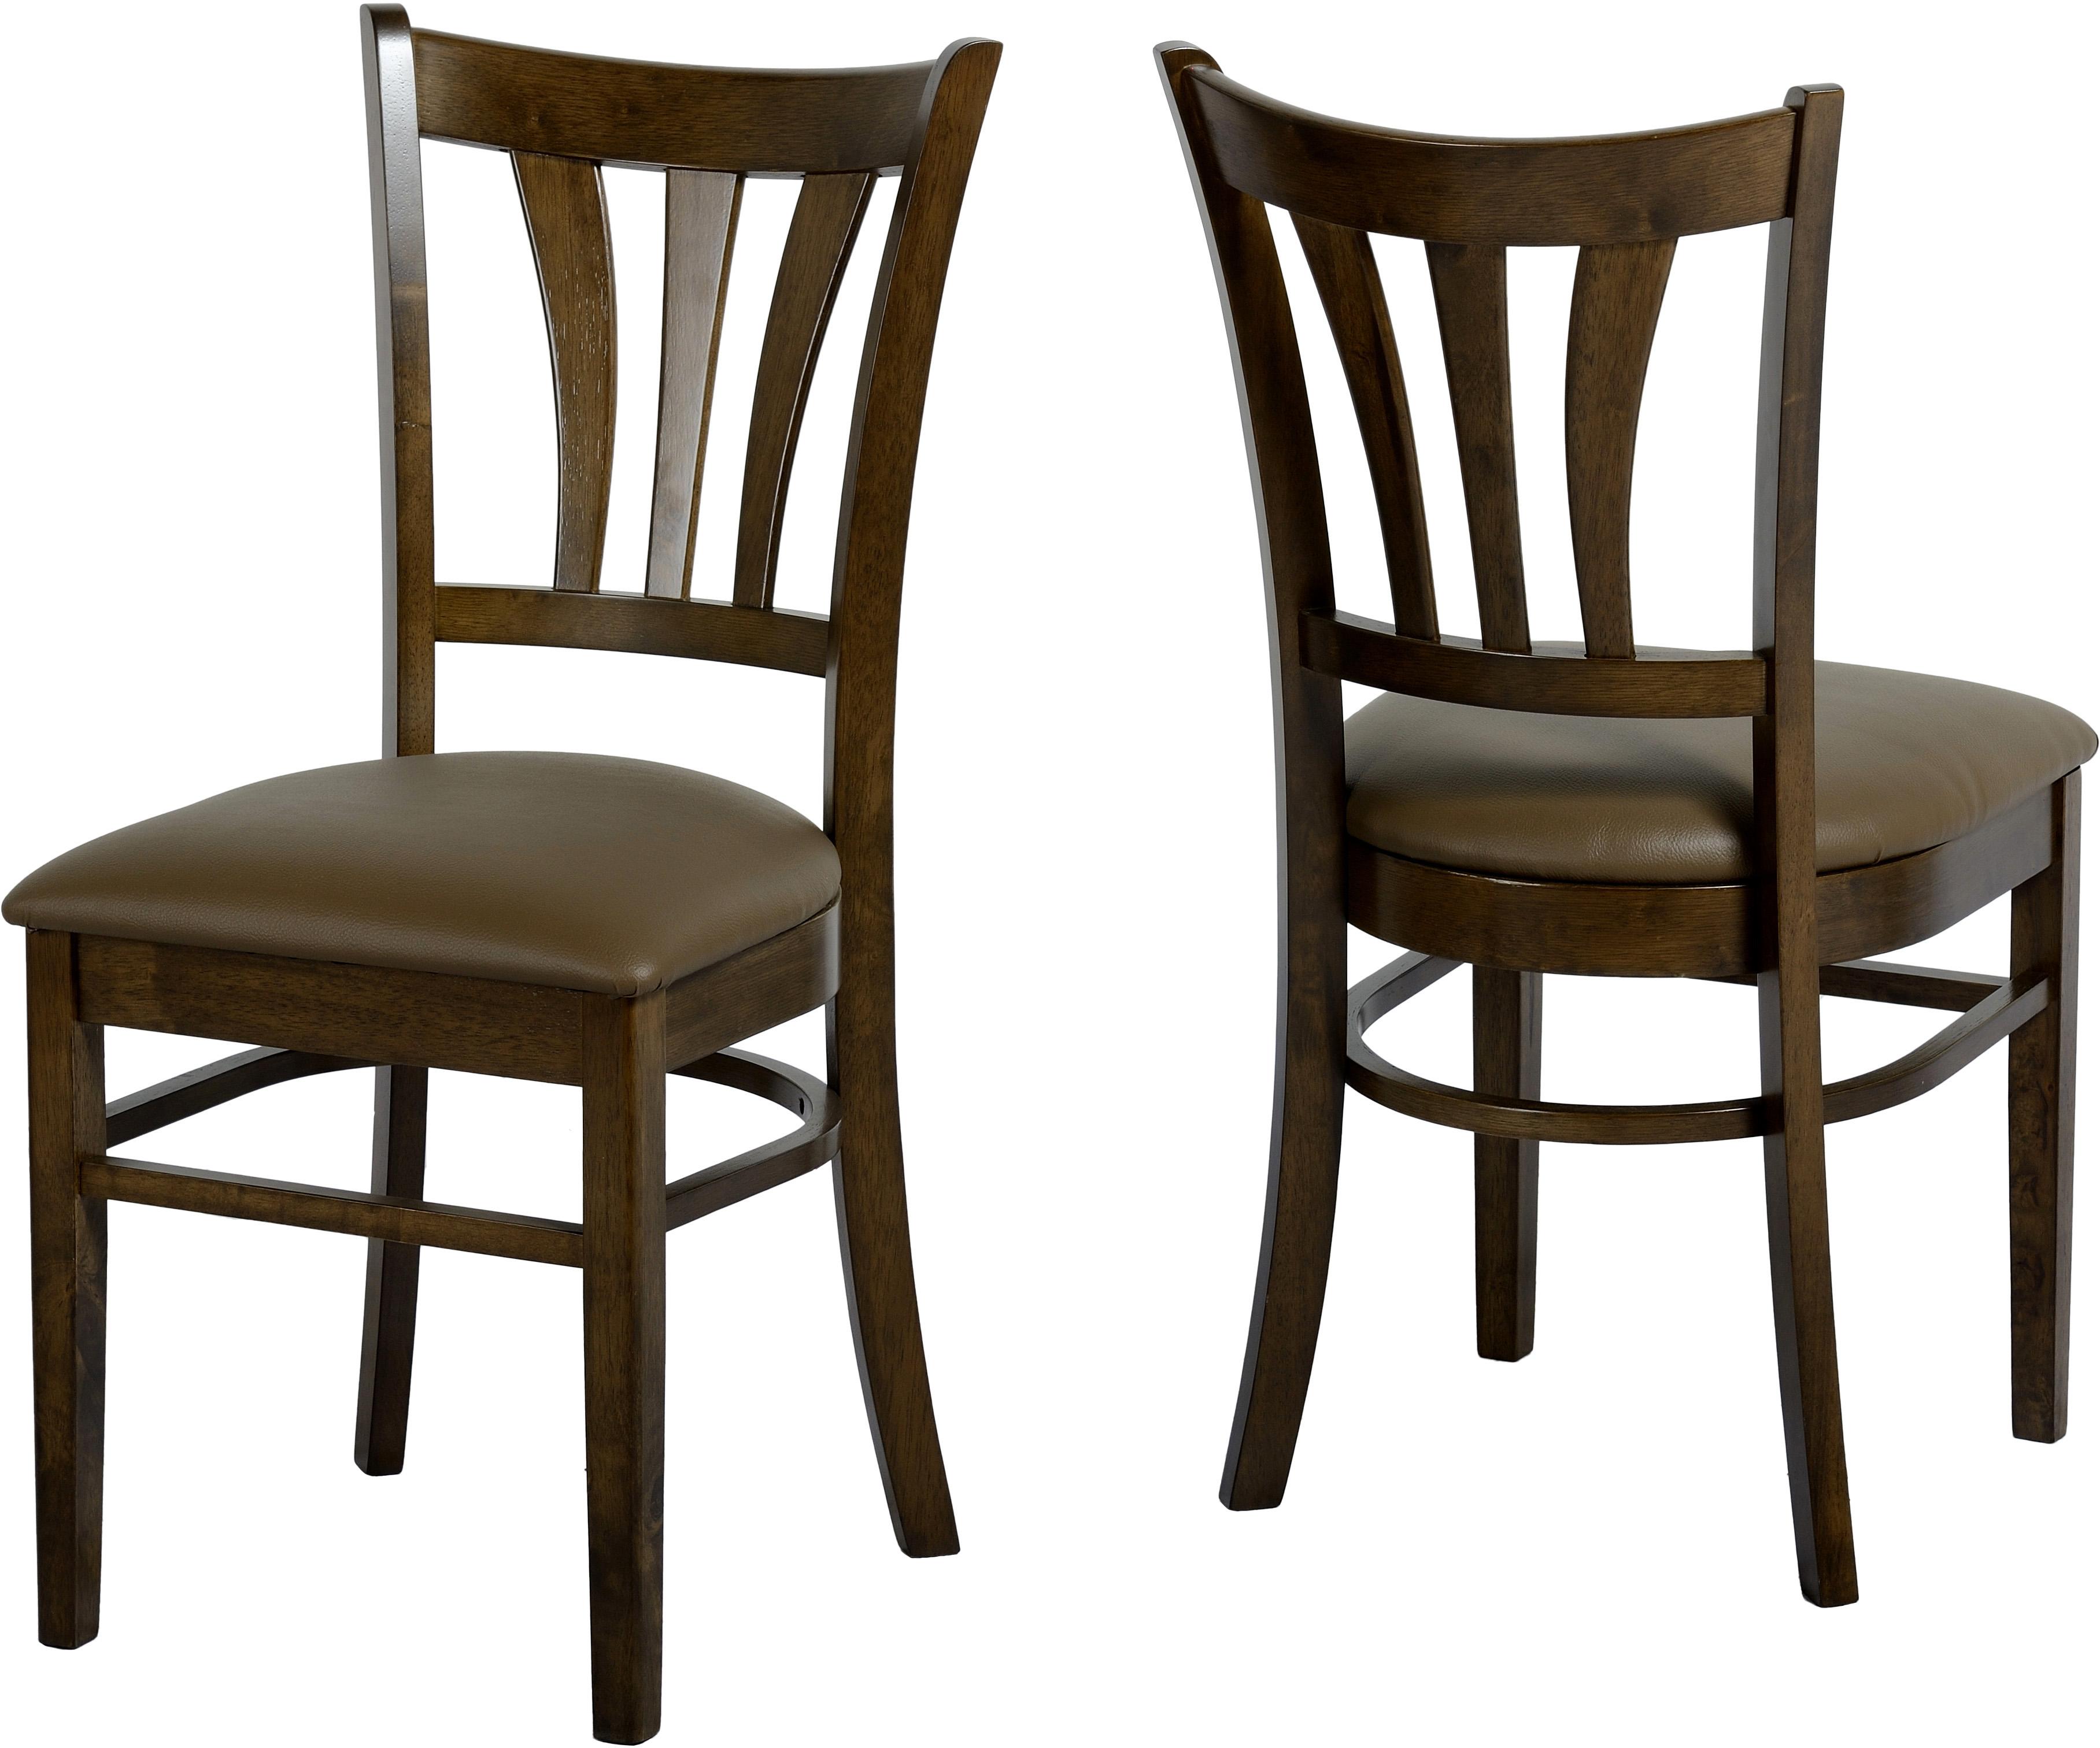 Grosvenor Chair Walnut June 2012